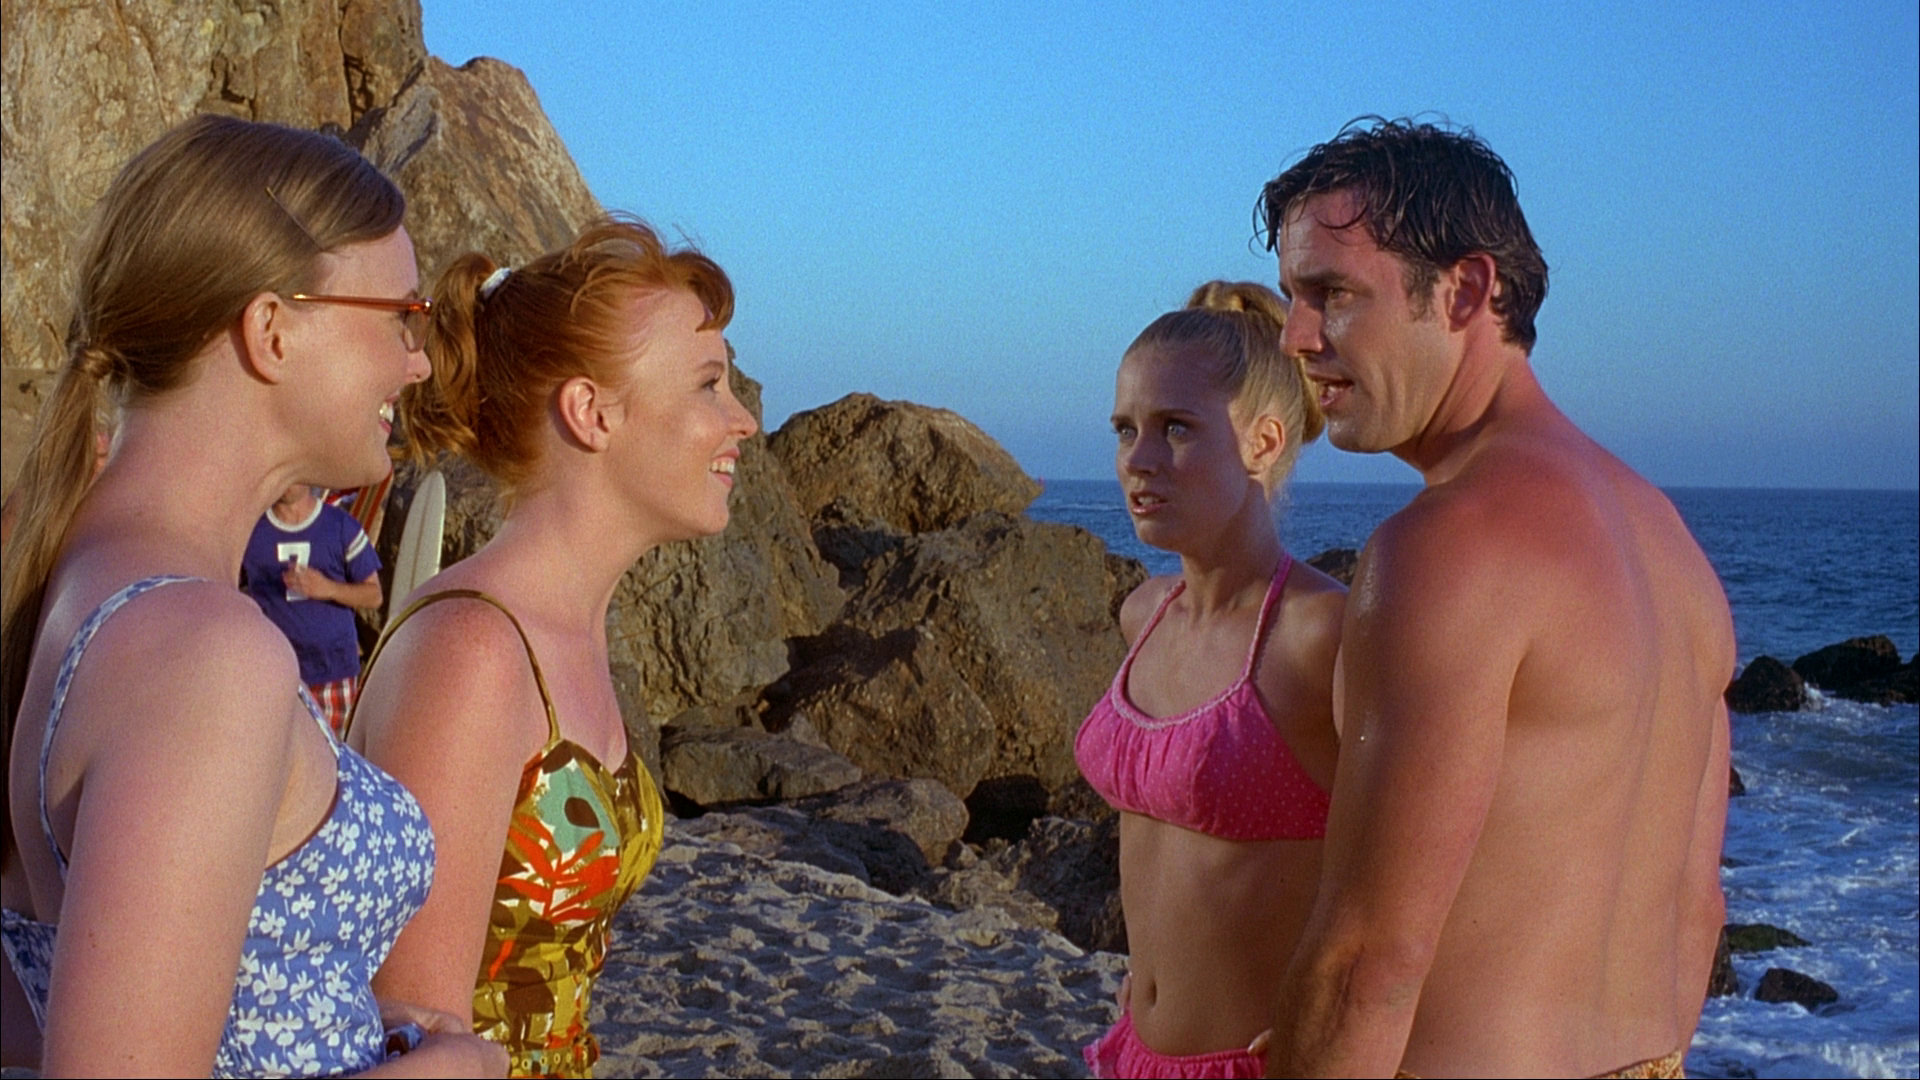 High-Def-Digest-Blu-ray-Review-Psycho-Beach-Party-Lauren-Ambrose-Amy-Adams-Charles-Busch-4